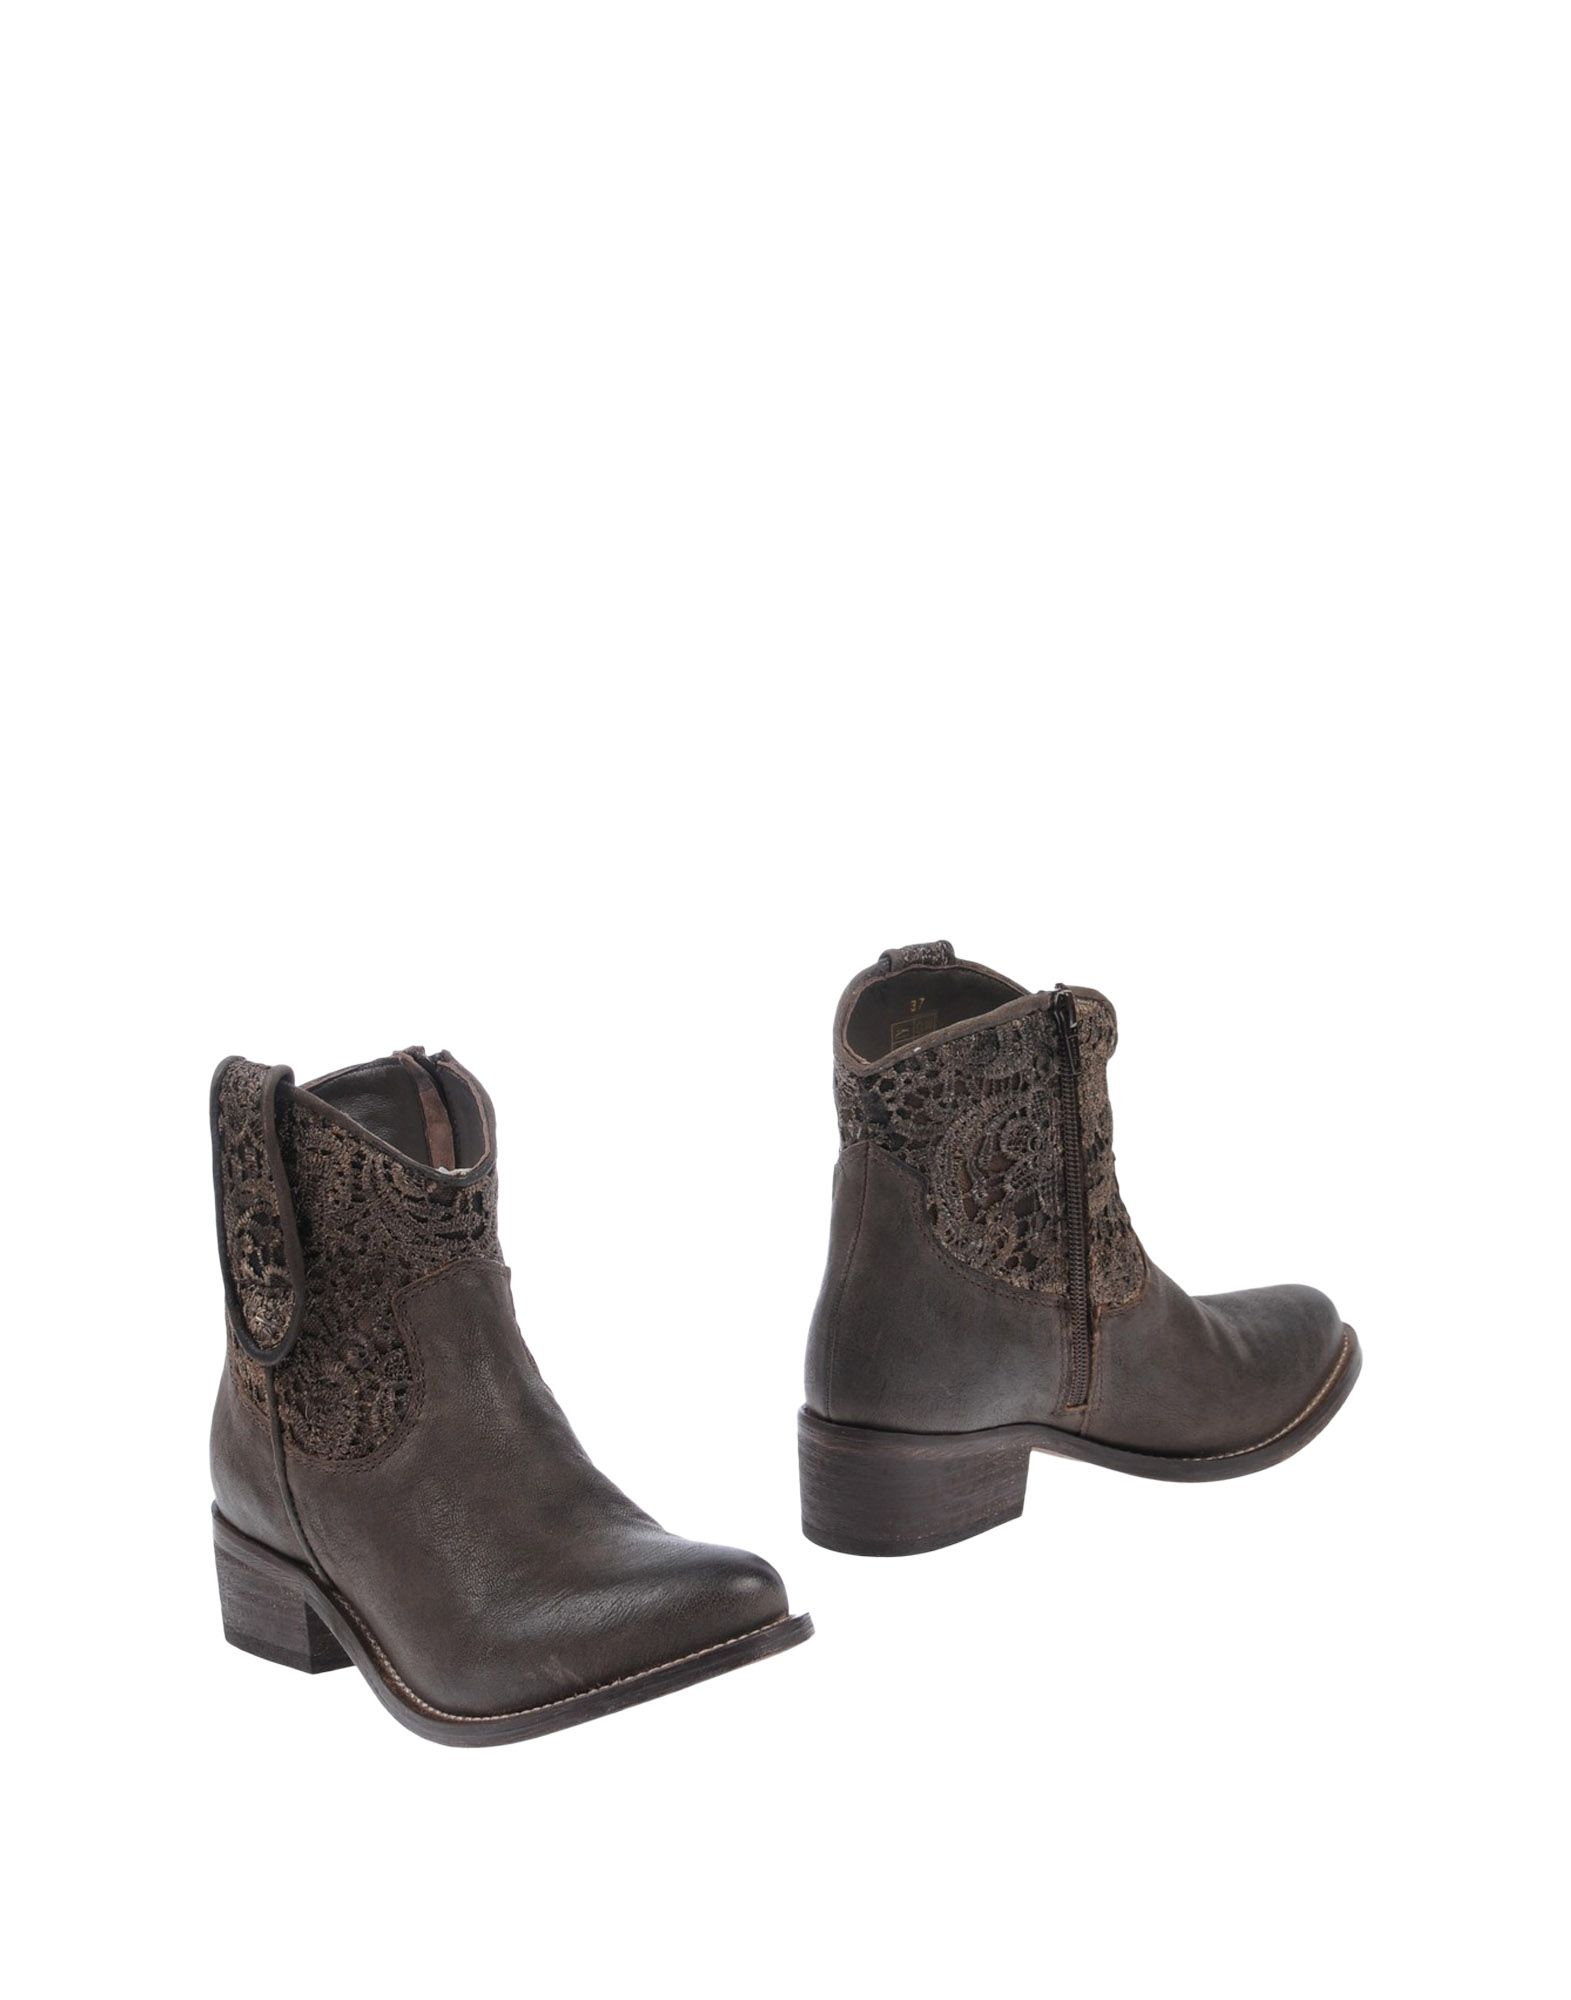 E.G.J. Ankle Boot Boots - Women E.G.J. Ankle Boots Boot online on  Australia - 11506339FG 16bc3b